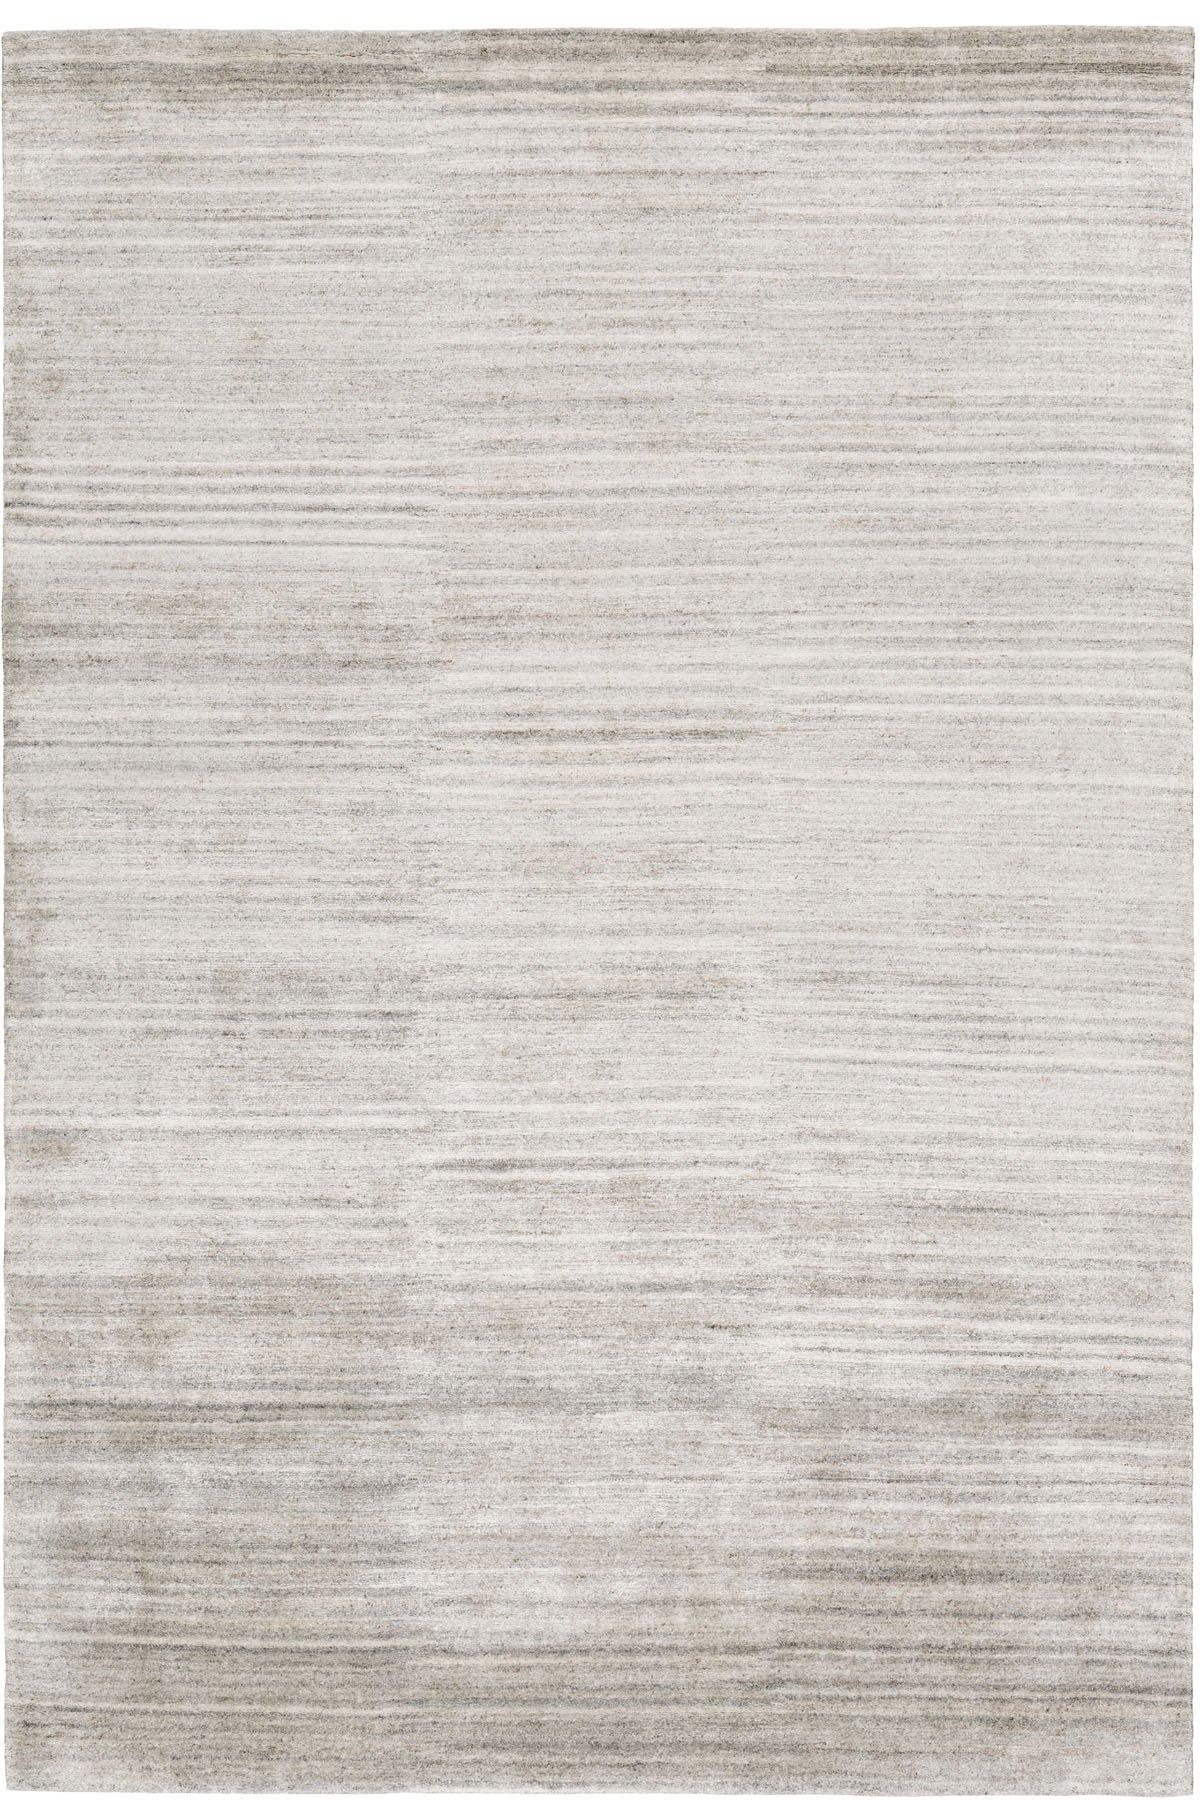 Aarambha 4.88x3.66m/16'x12' Grey Plain Bamboo silk Plain rug by The Rug Company